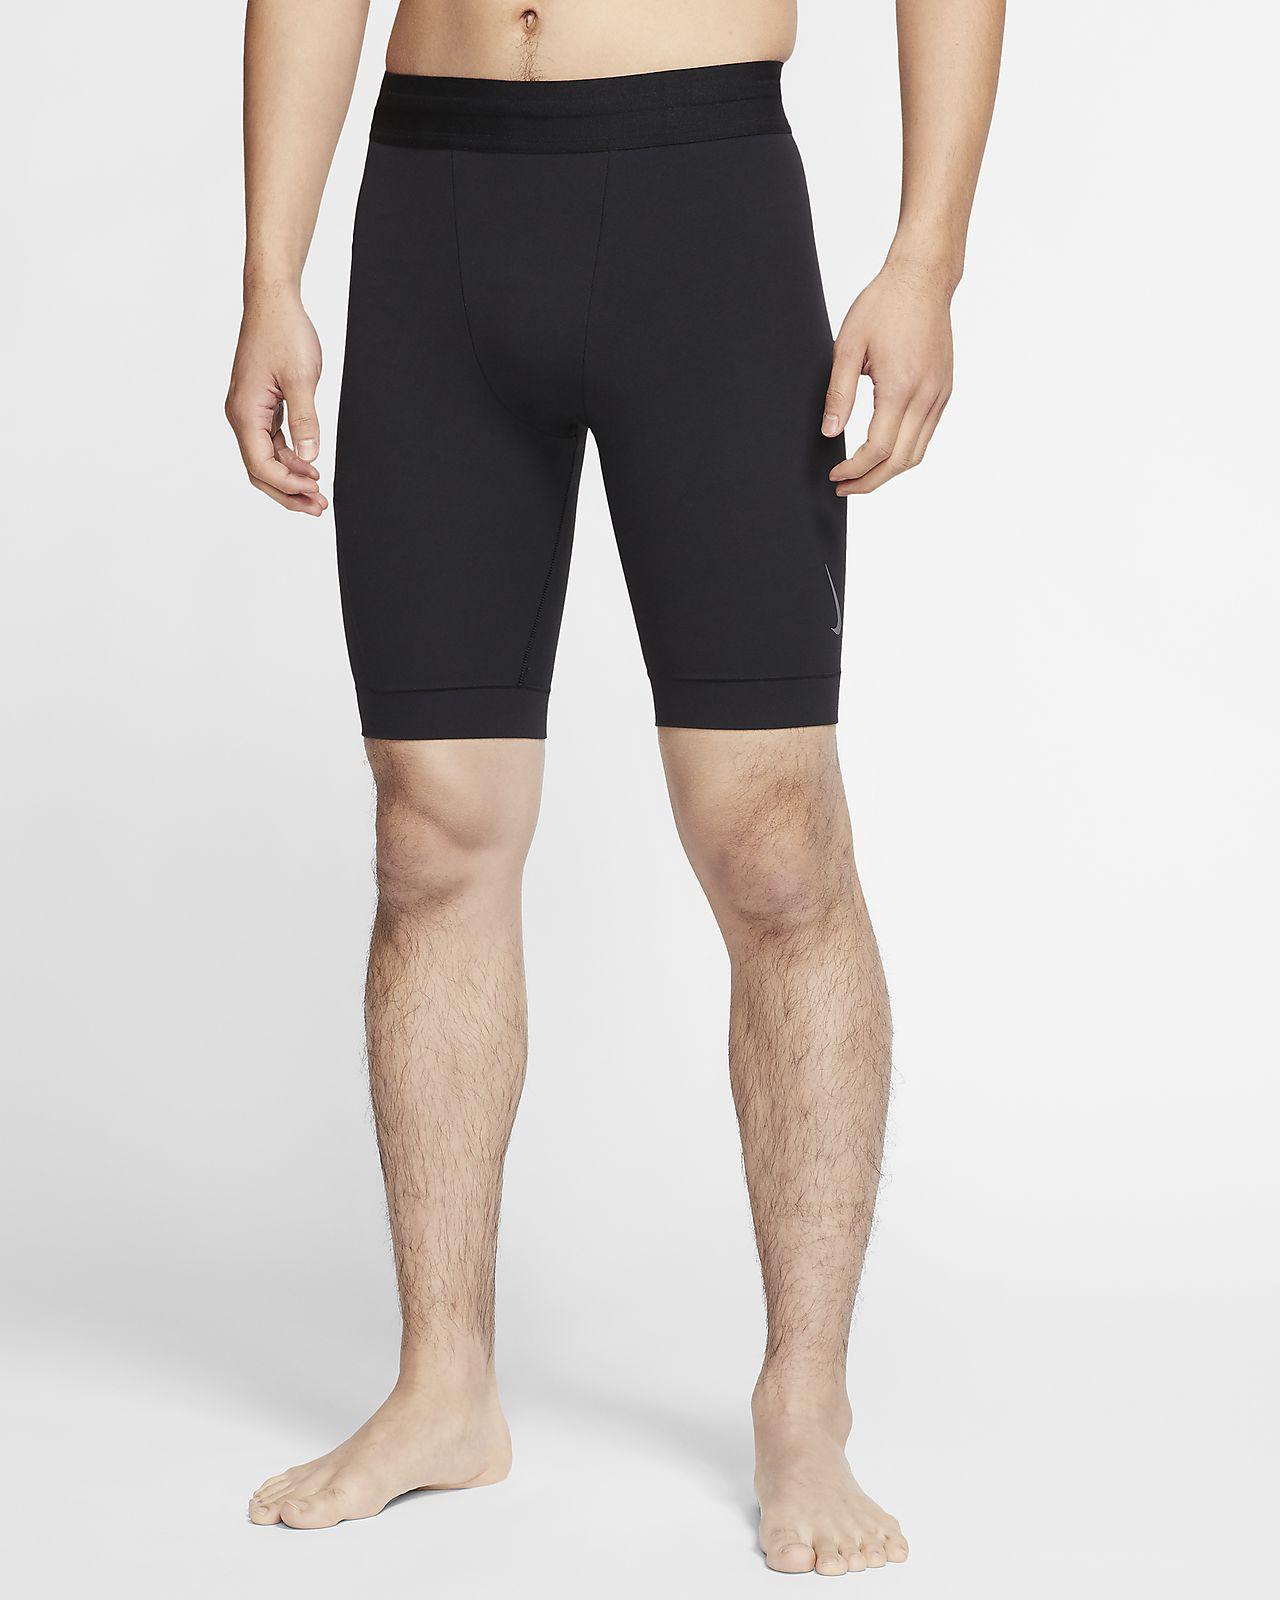 Nike Yoga Dri-FIT 男款 Infinalon 短褲